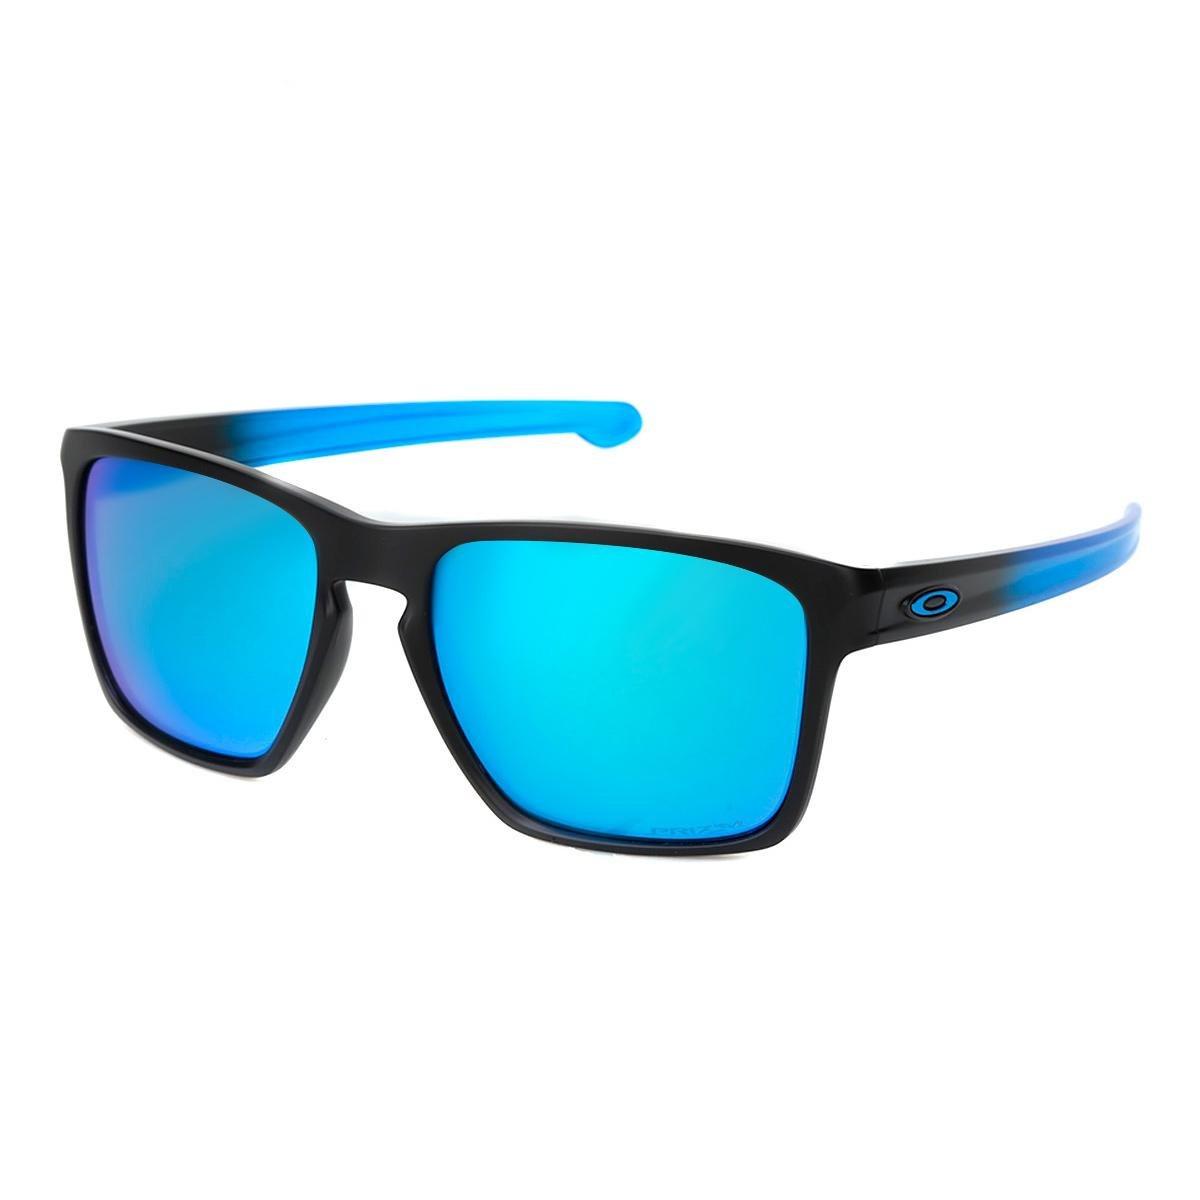 148ae9264 Óculos de Sol Oakley Sliver Xl-Polarized Masculino